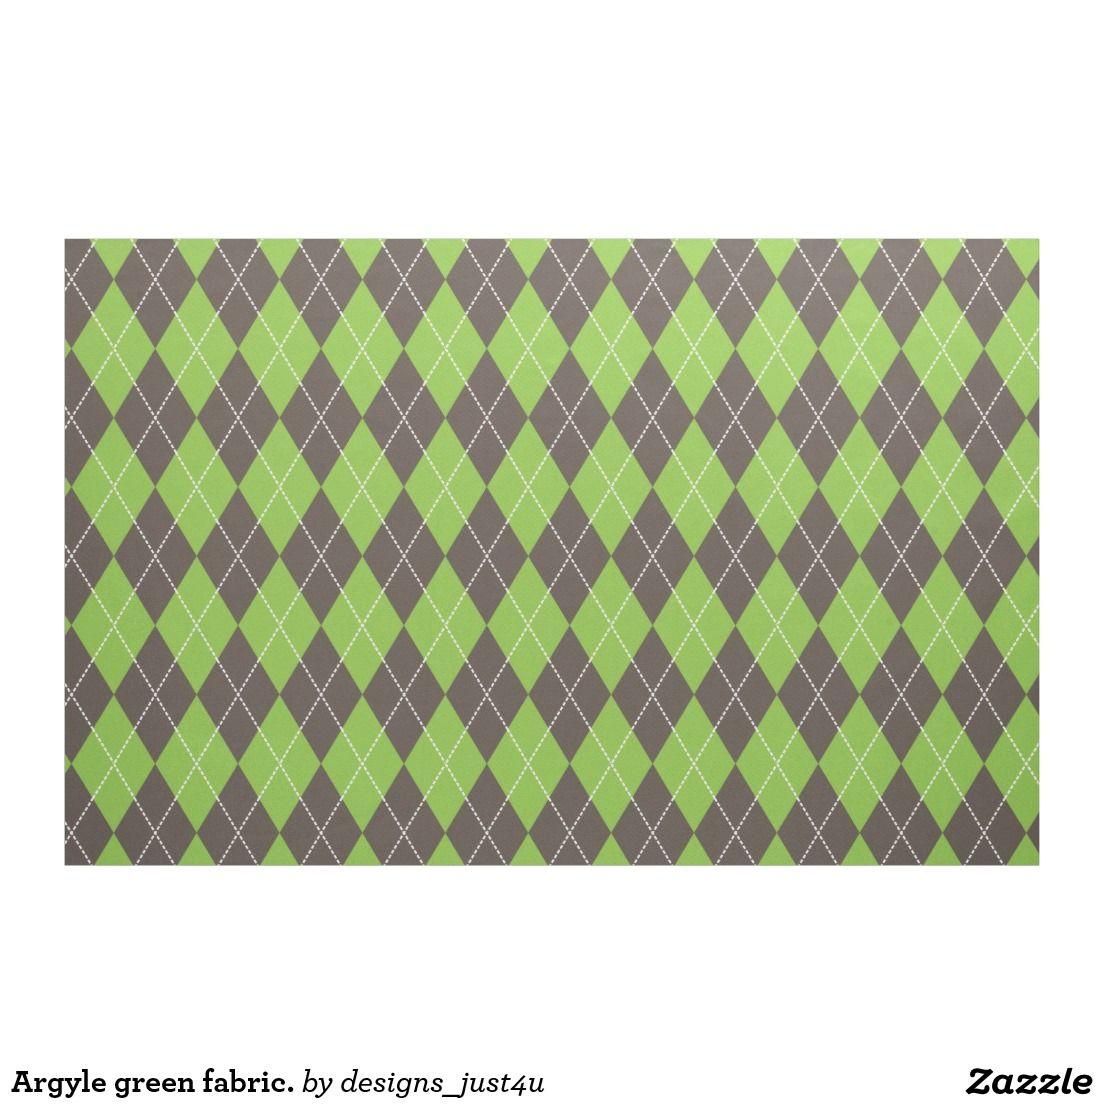 Argyle green fabric.